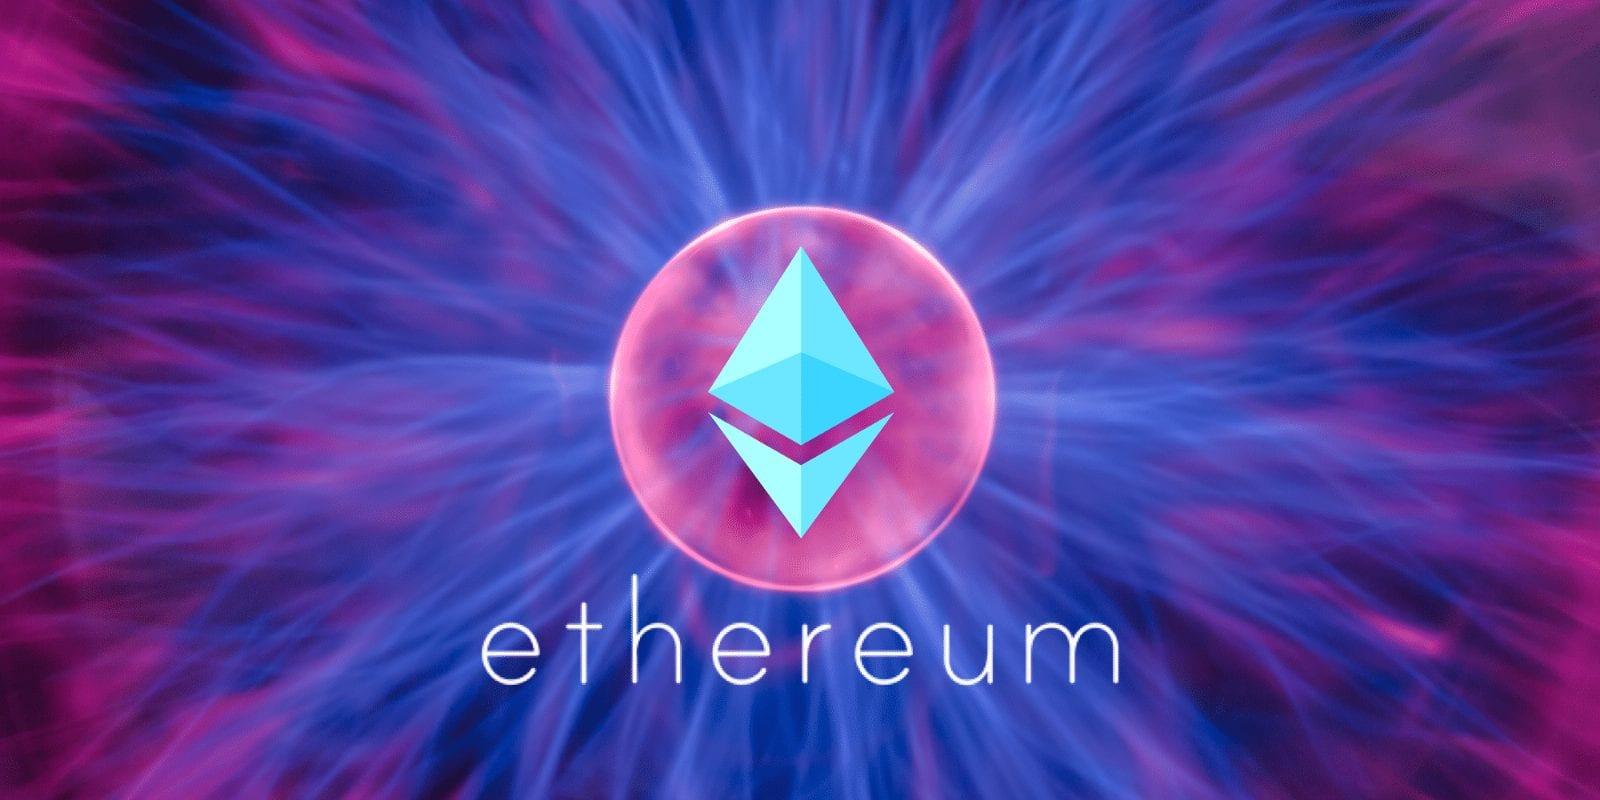 ETH - Ethereum (ETH) Marks New Milestone; Surpasses 200k Smart Contracts